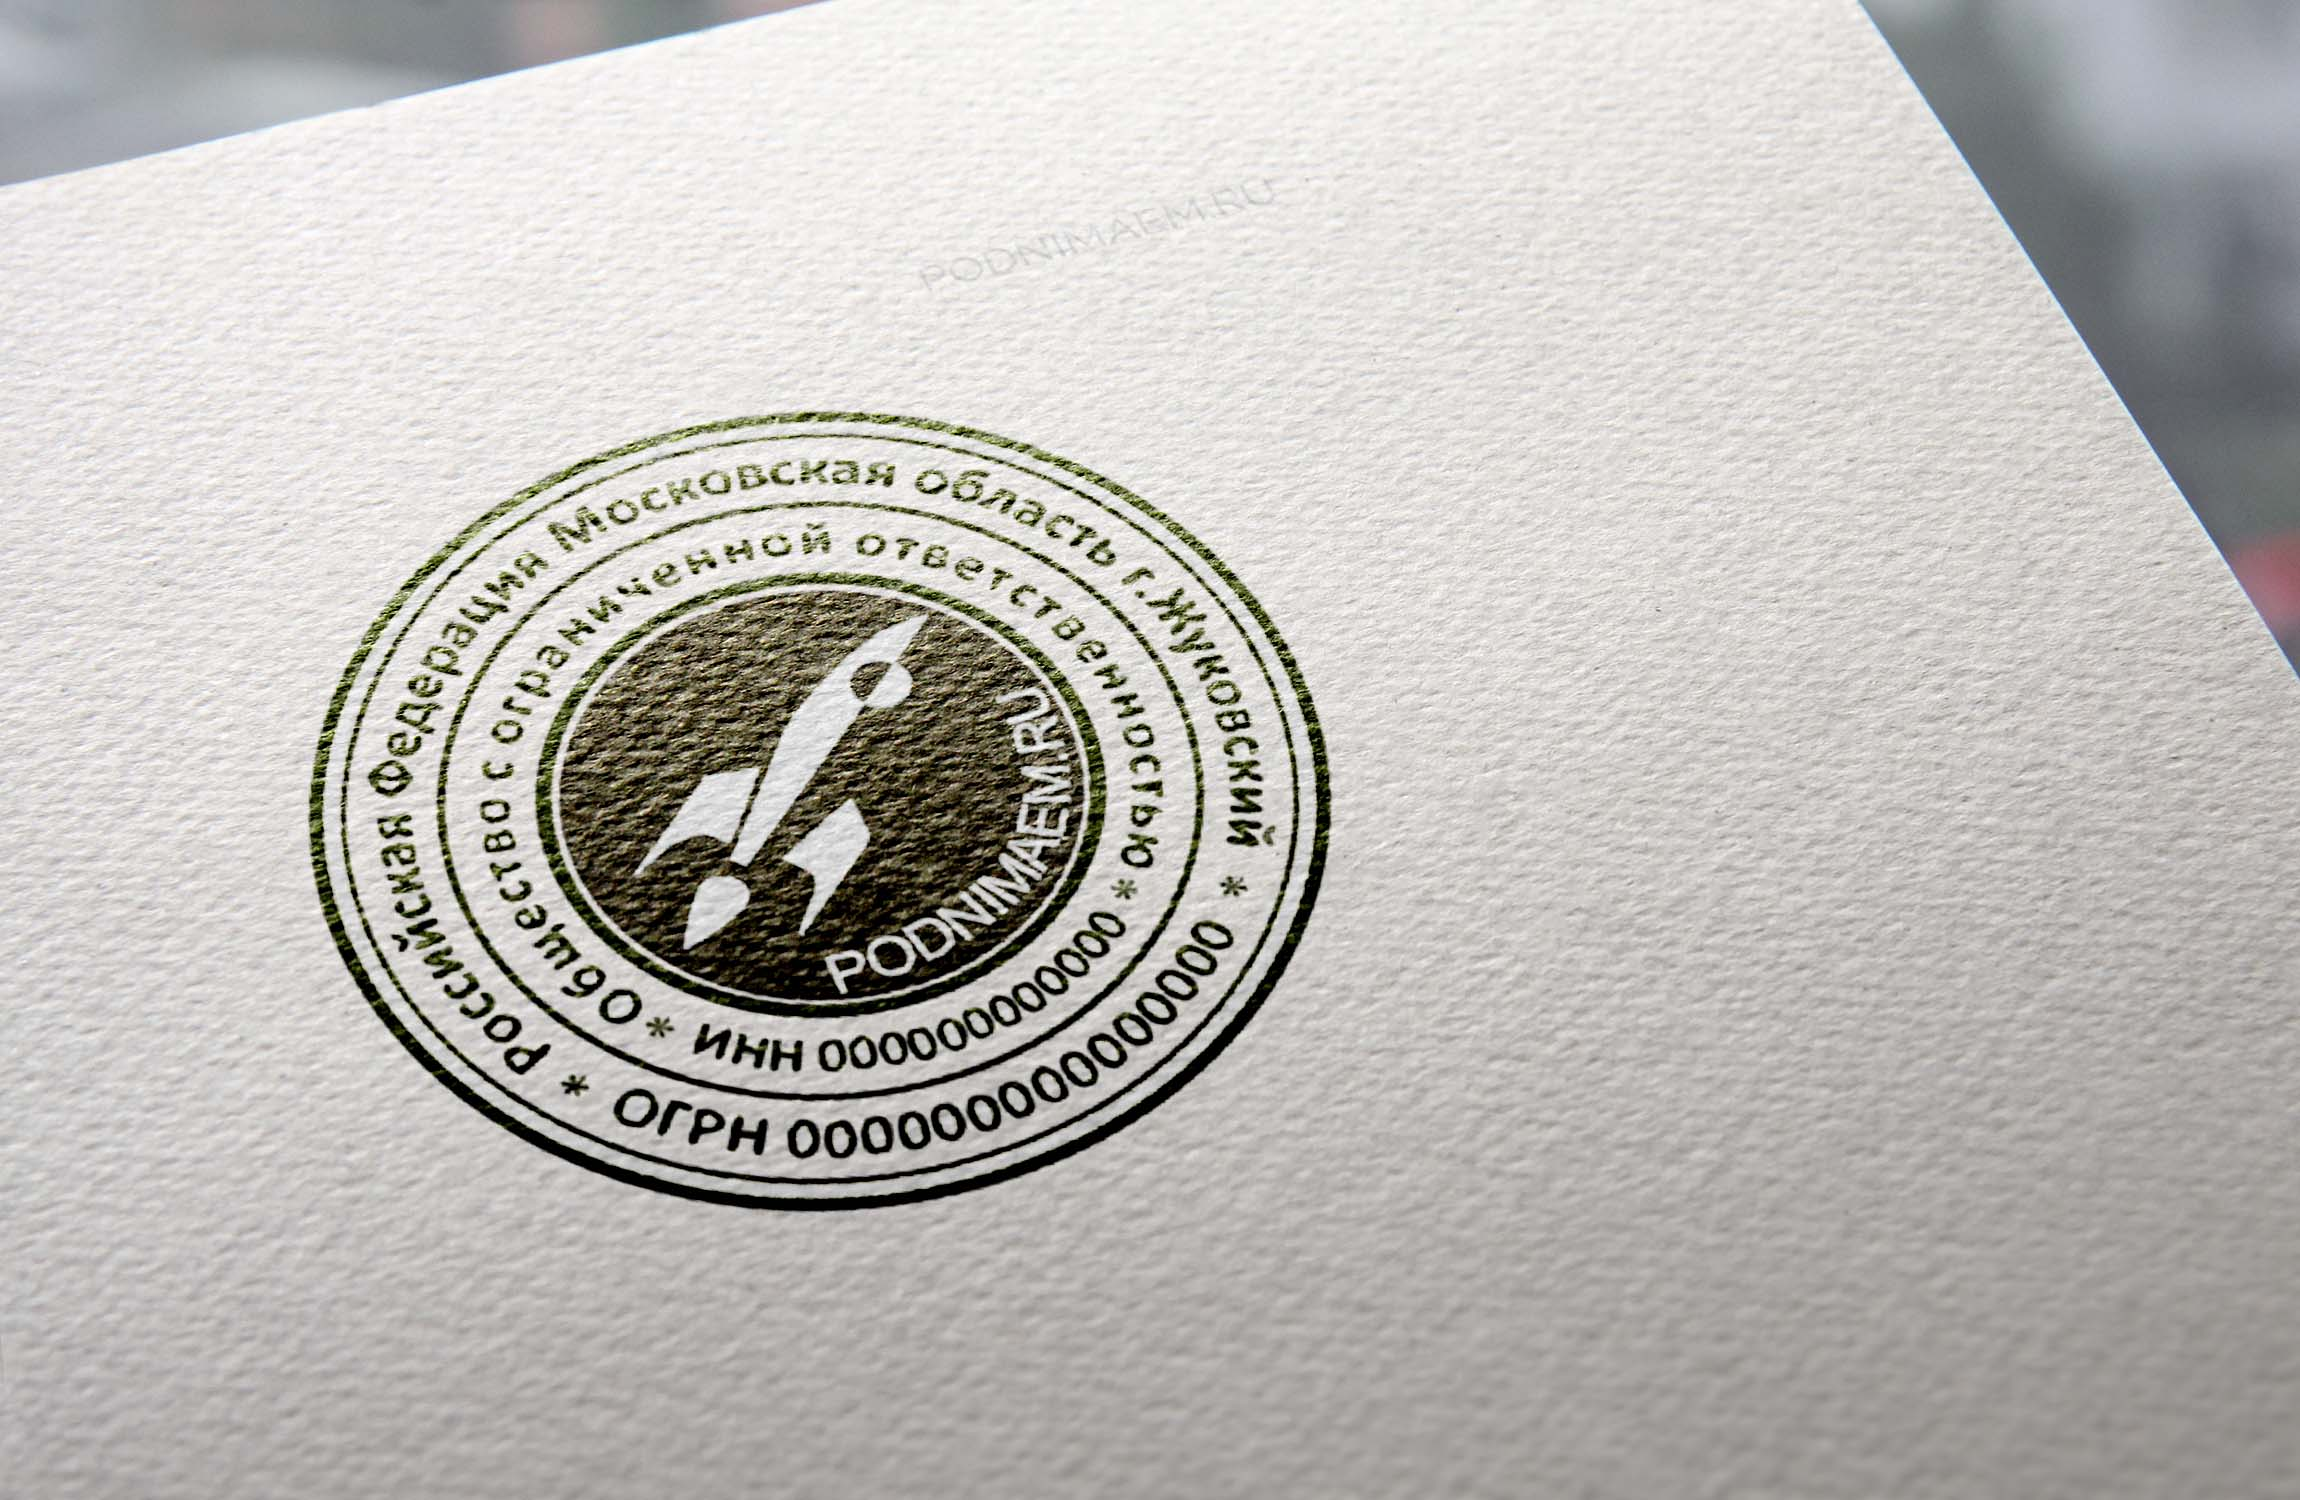 Разработать логотип + визитку + логотип для печати ООО +++ фото f_8955546afc8aacf1.jpg